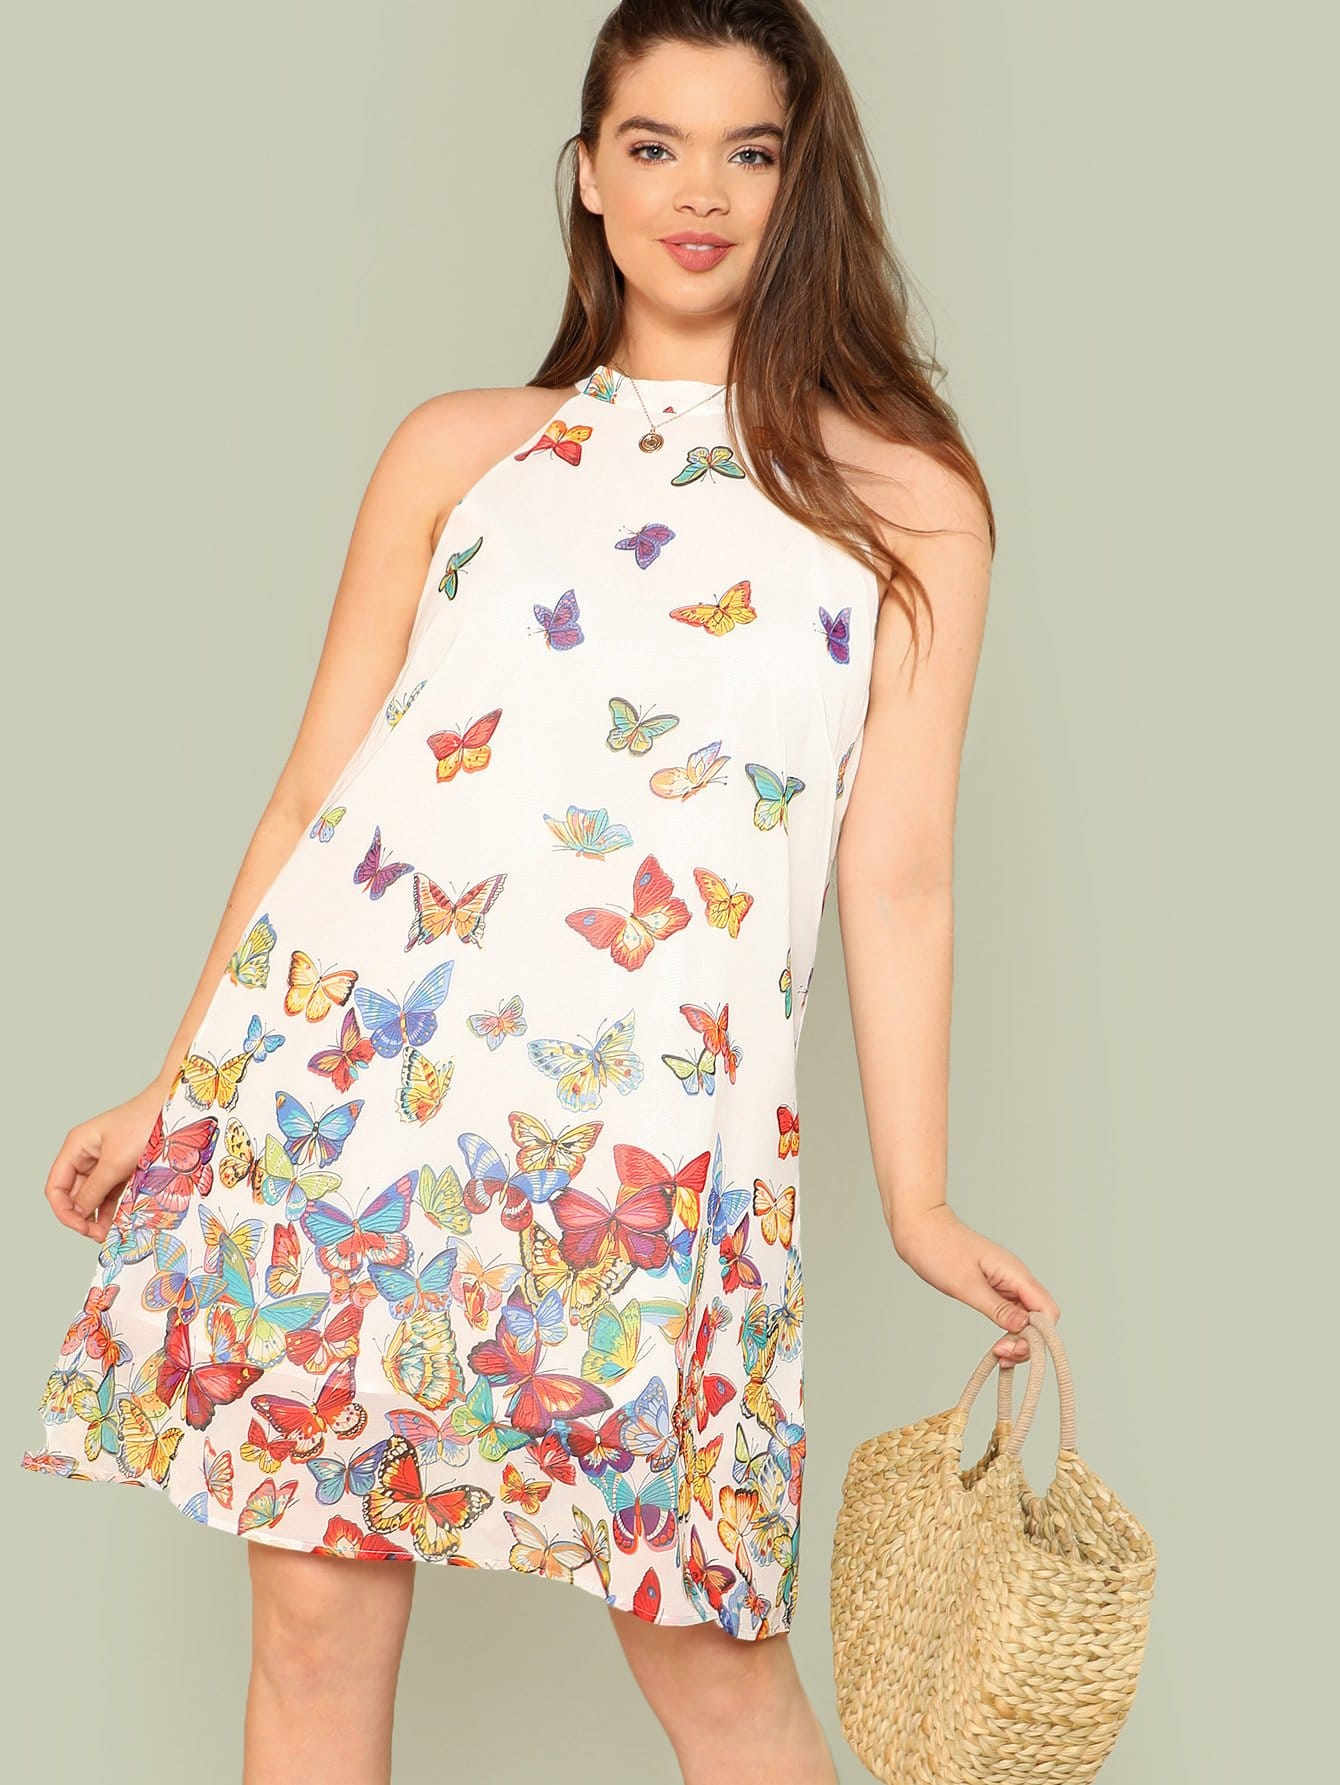 Butterfly Print Halter Tunic Dress butterfly print halter tunic dress